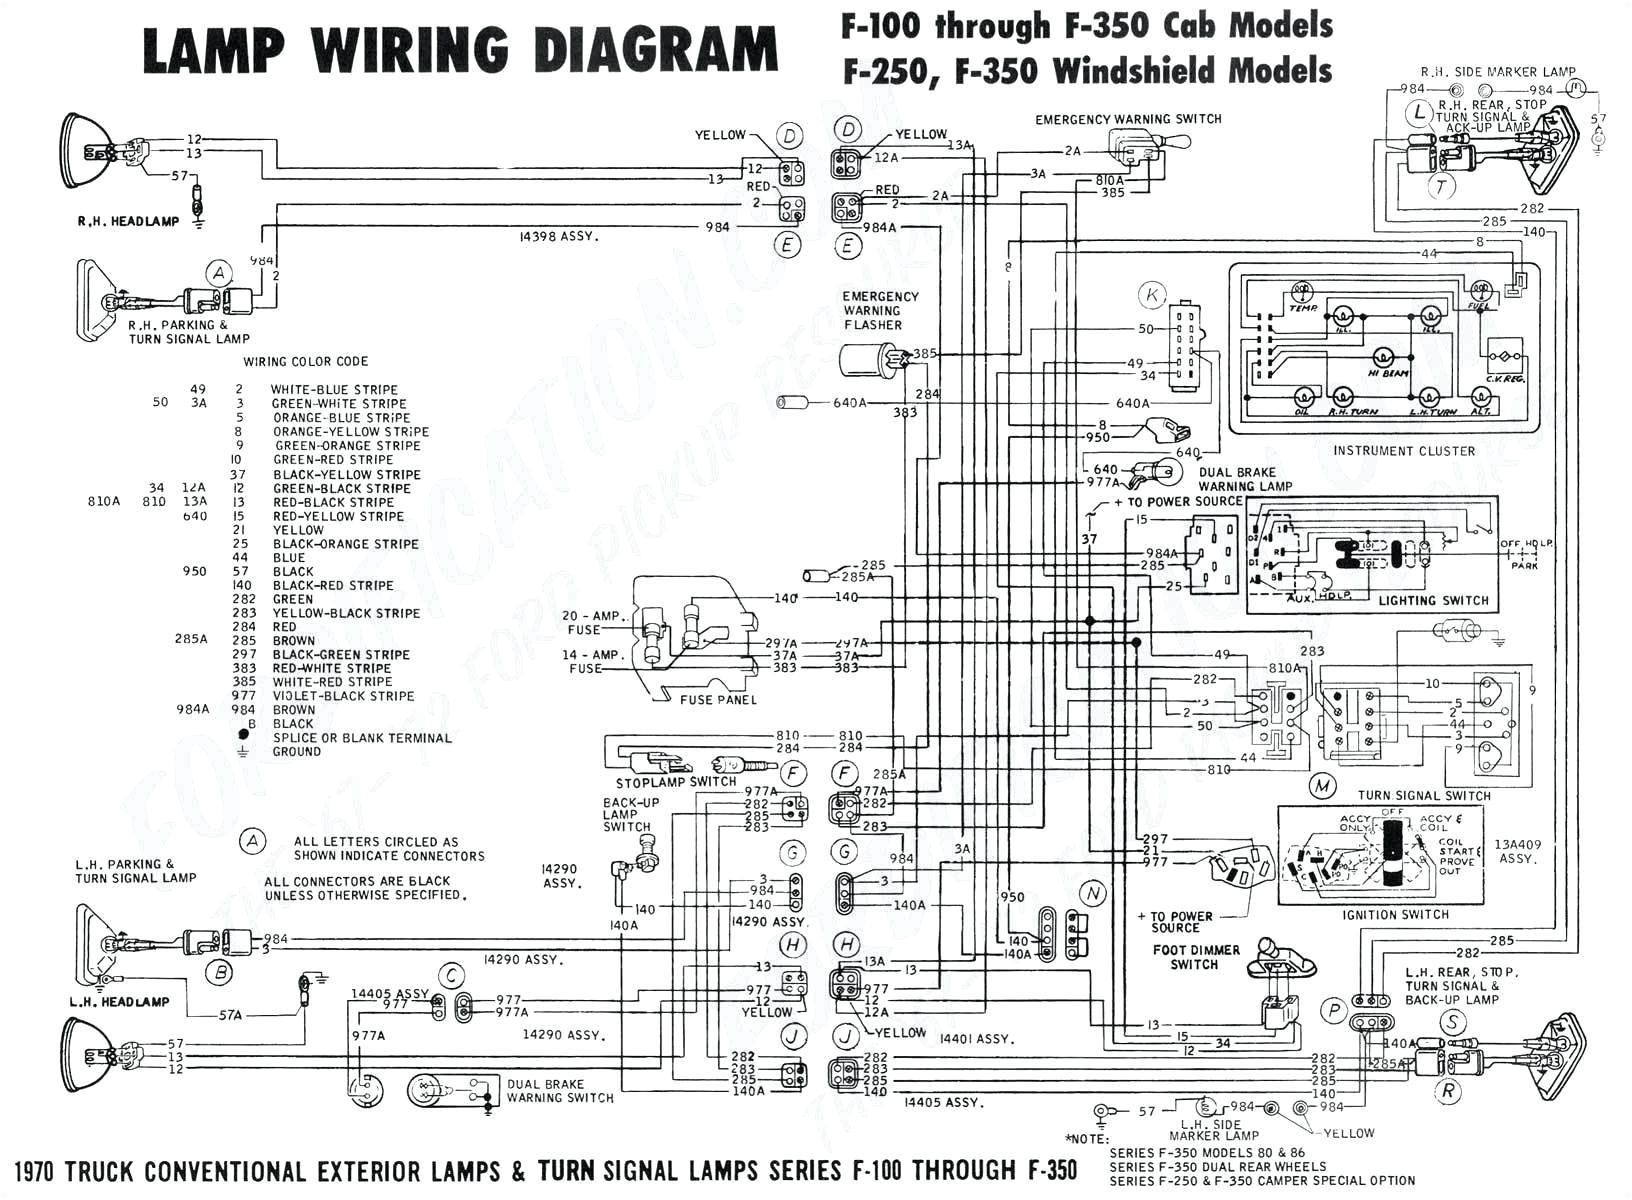 1936 chevy wiring diagram